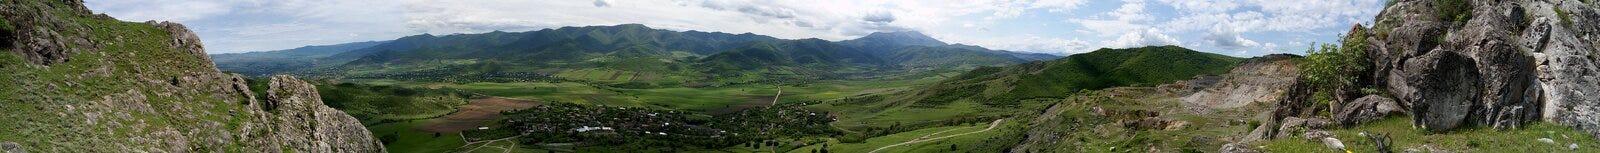 Panorama im Georgia-Himmelblauweiß stockfotografie